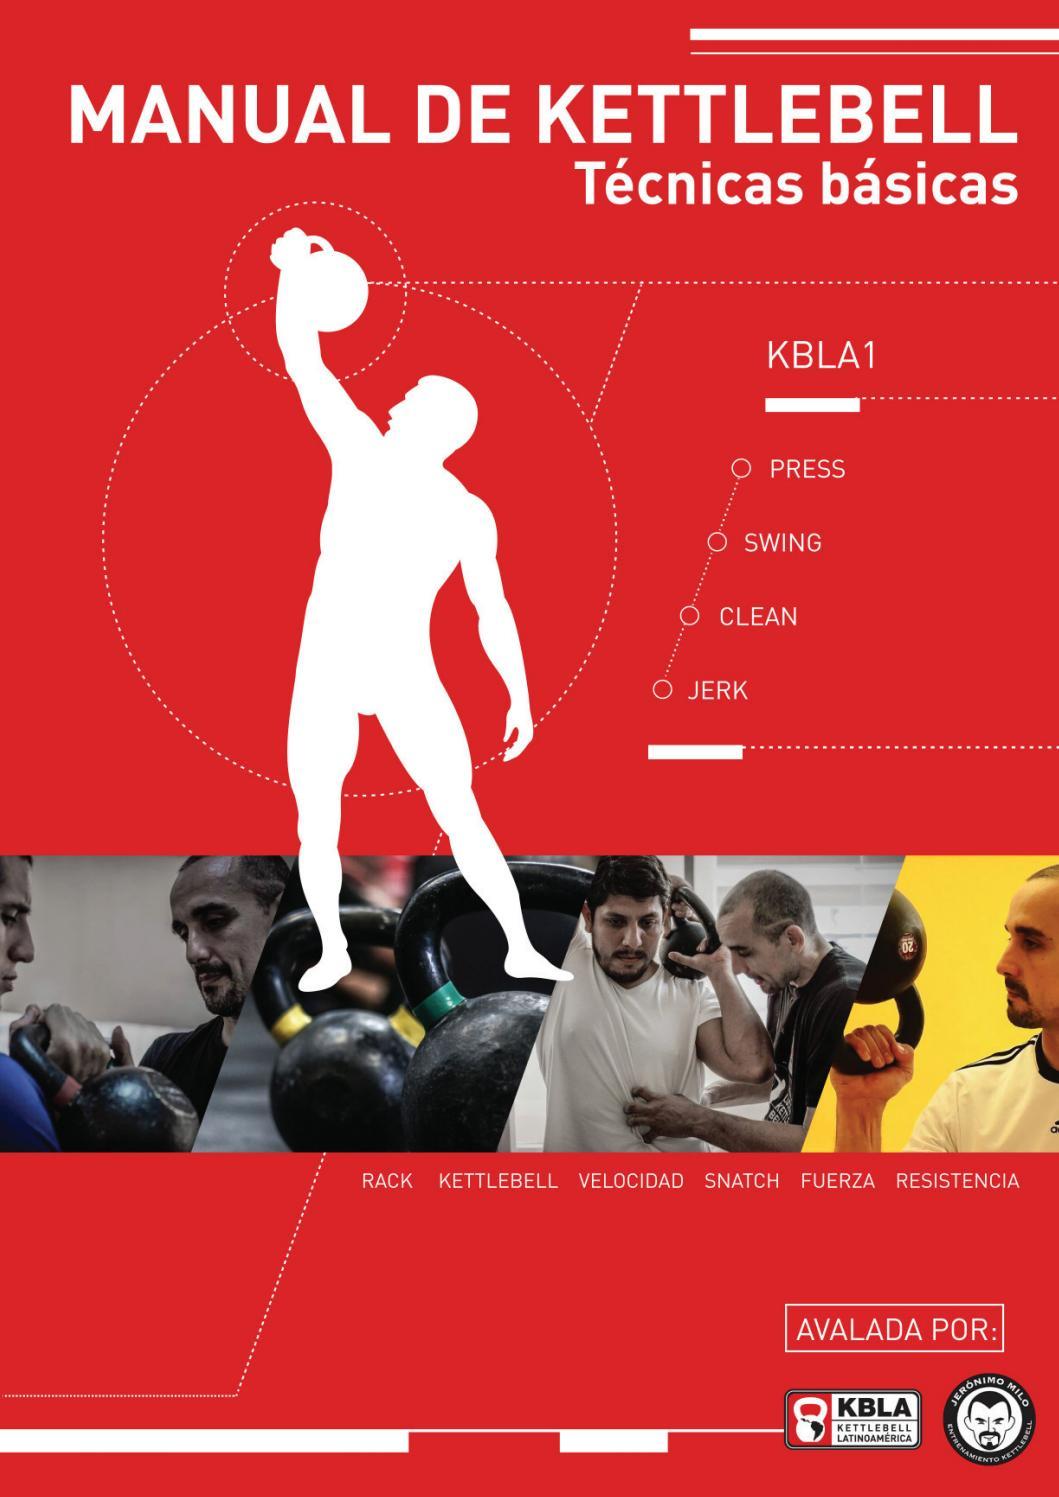 Manual de kettlebells nivel 1 kbla 2016 alta calidad by lahuel rojas ...